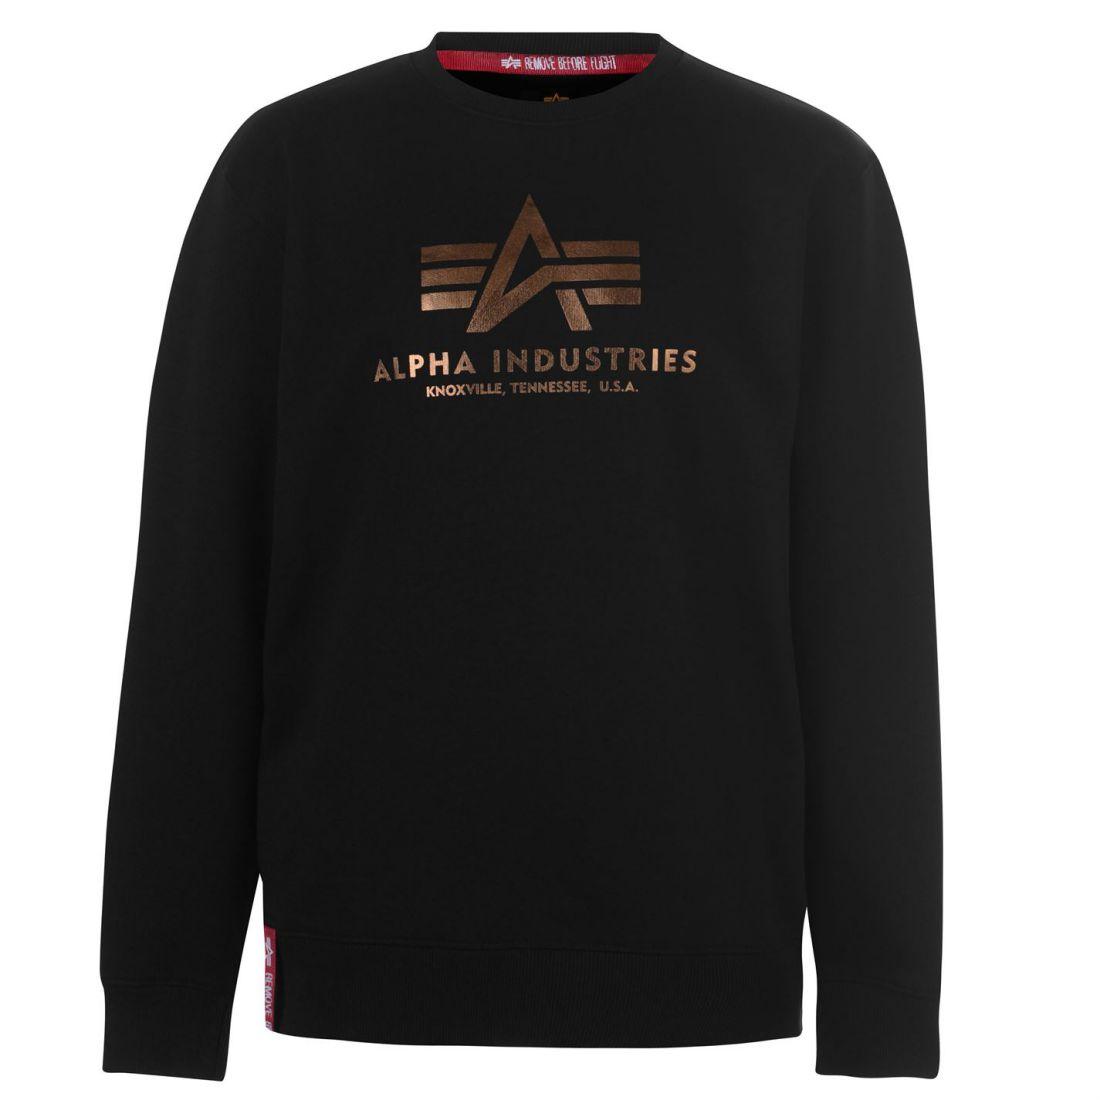 798fe3775 Mens Alpha Industries Basic Sweater Crew Long Sleeve New | eBay